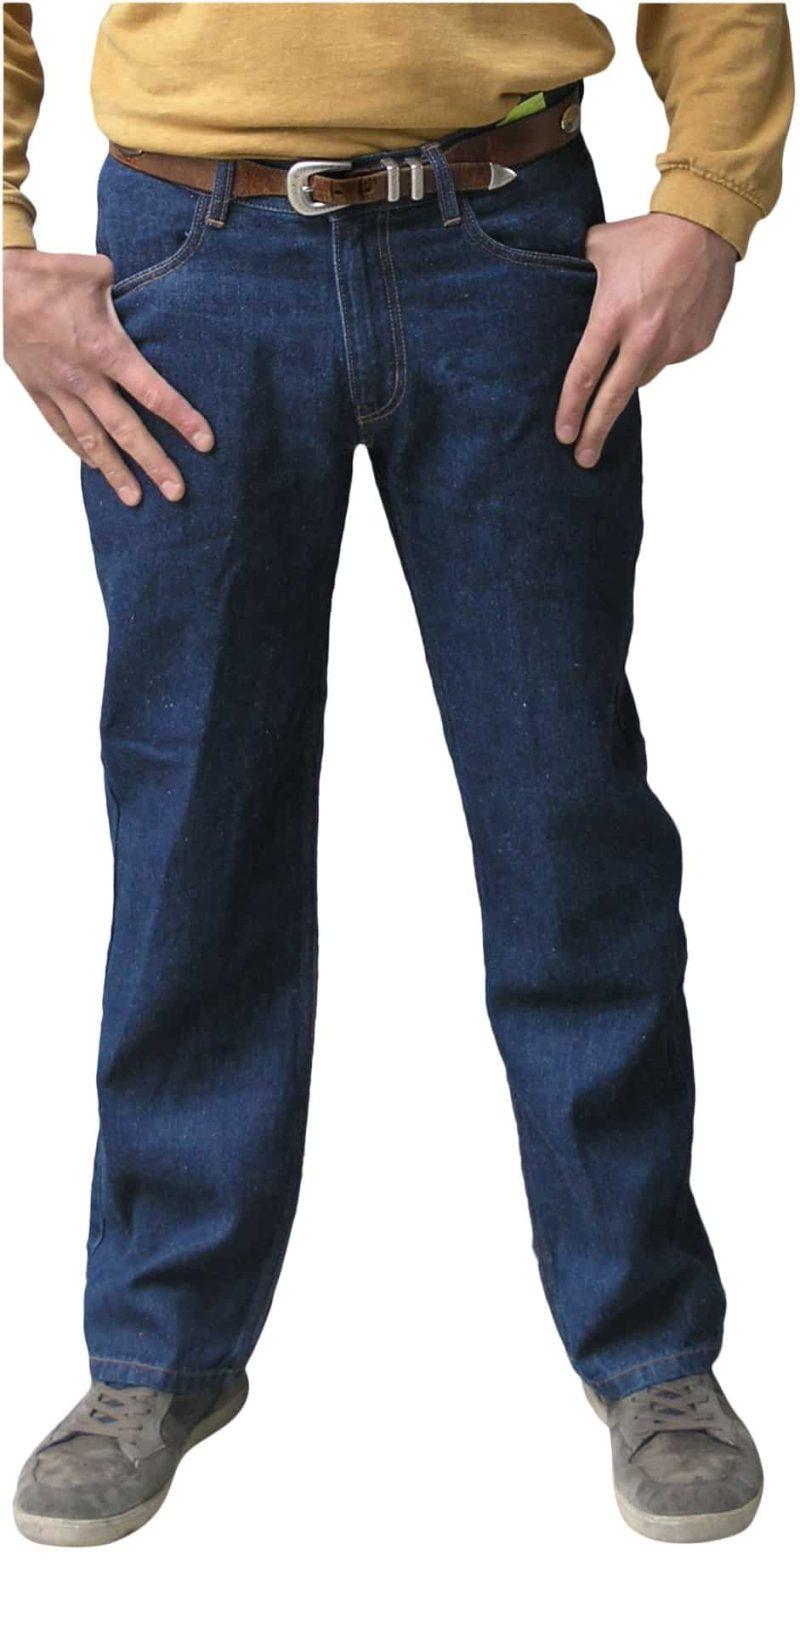 Chi Hemp Jeans